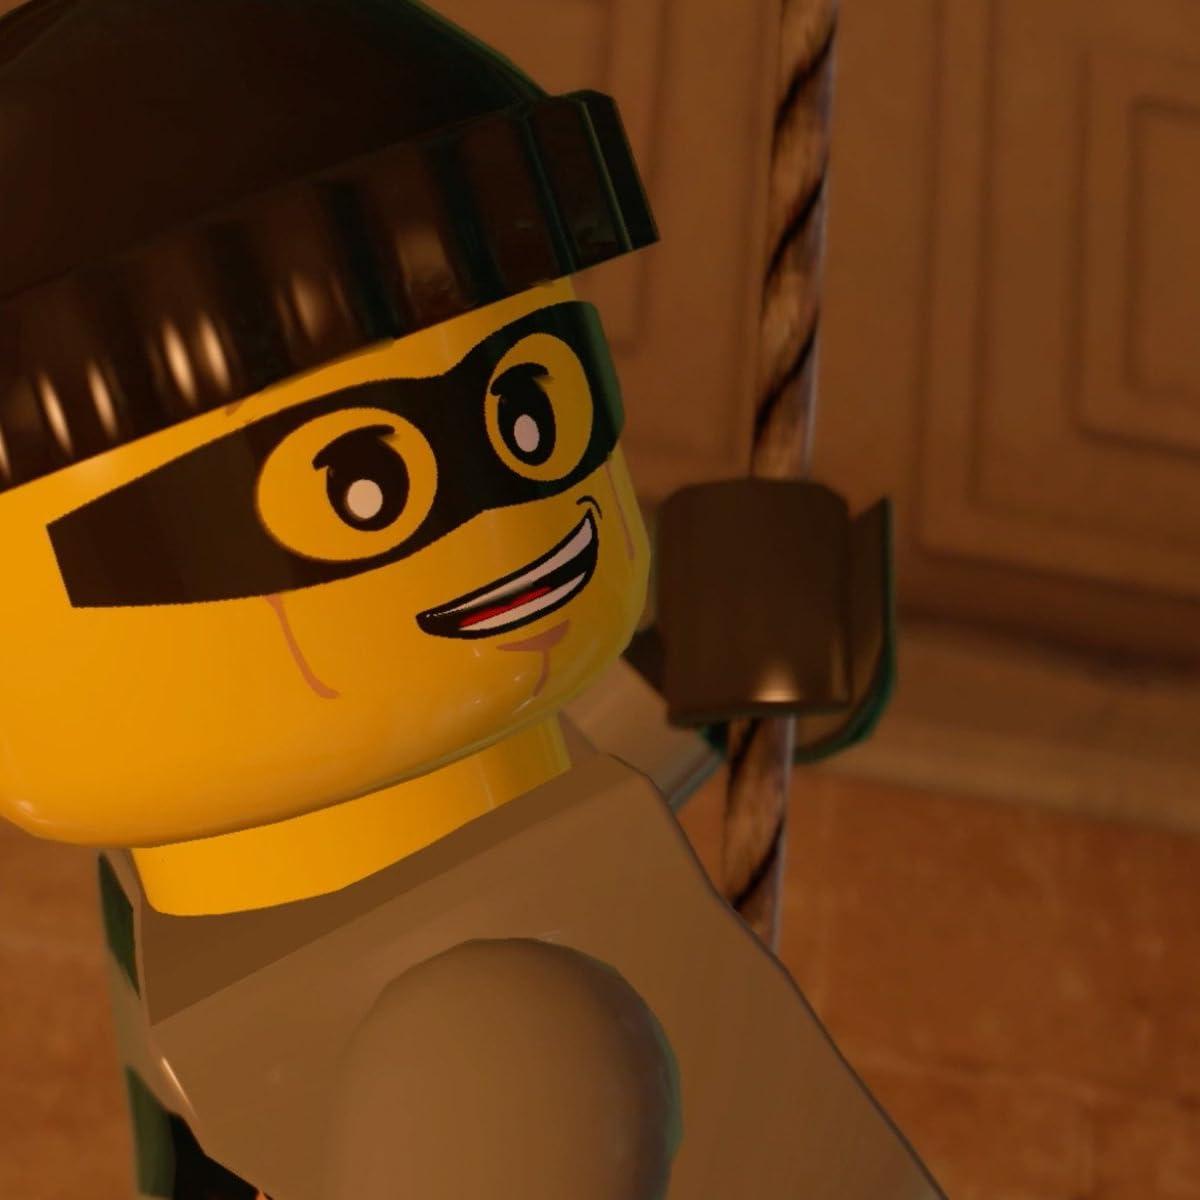 Lego レゴ Ipad壁紙 The Next Heist その他 スマホ用画像136560